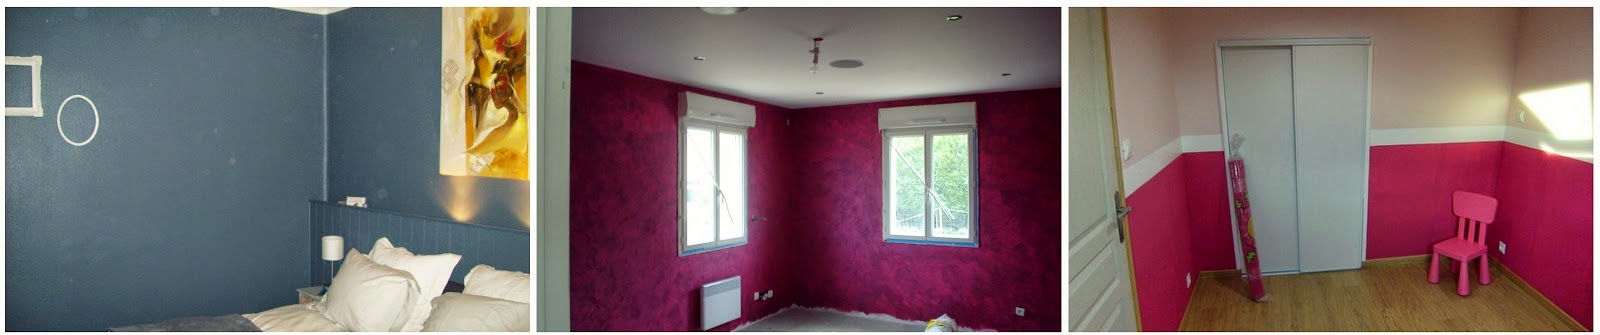 Renovation travaux peinture chambre paris artisan Travaux peinture